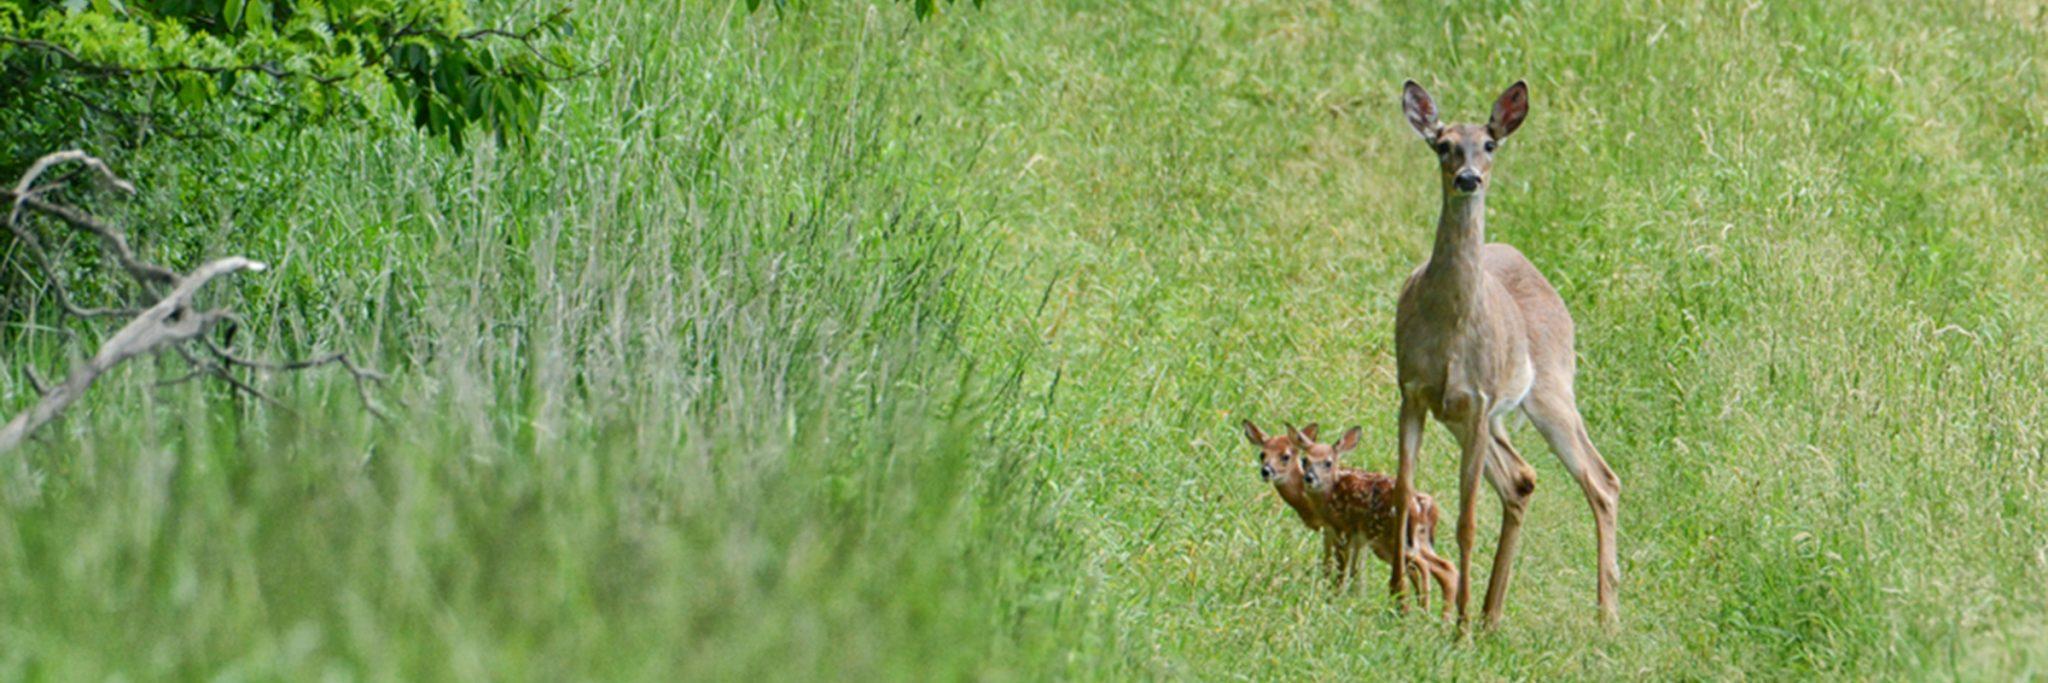 Photo of Mama and Baby Deer